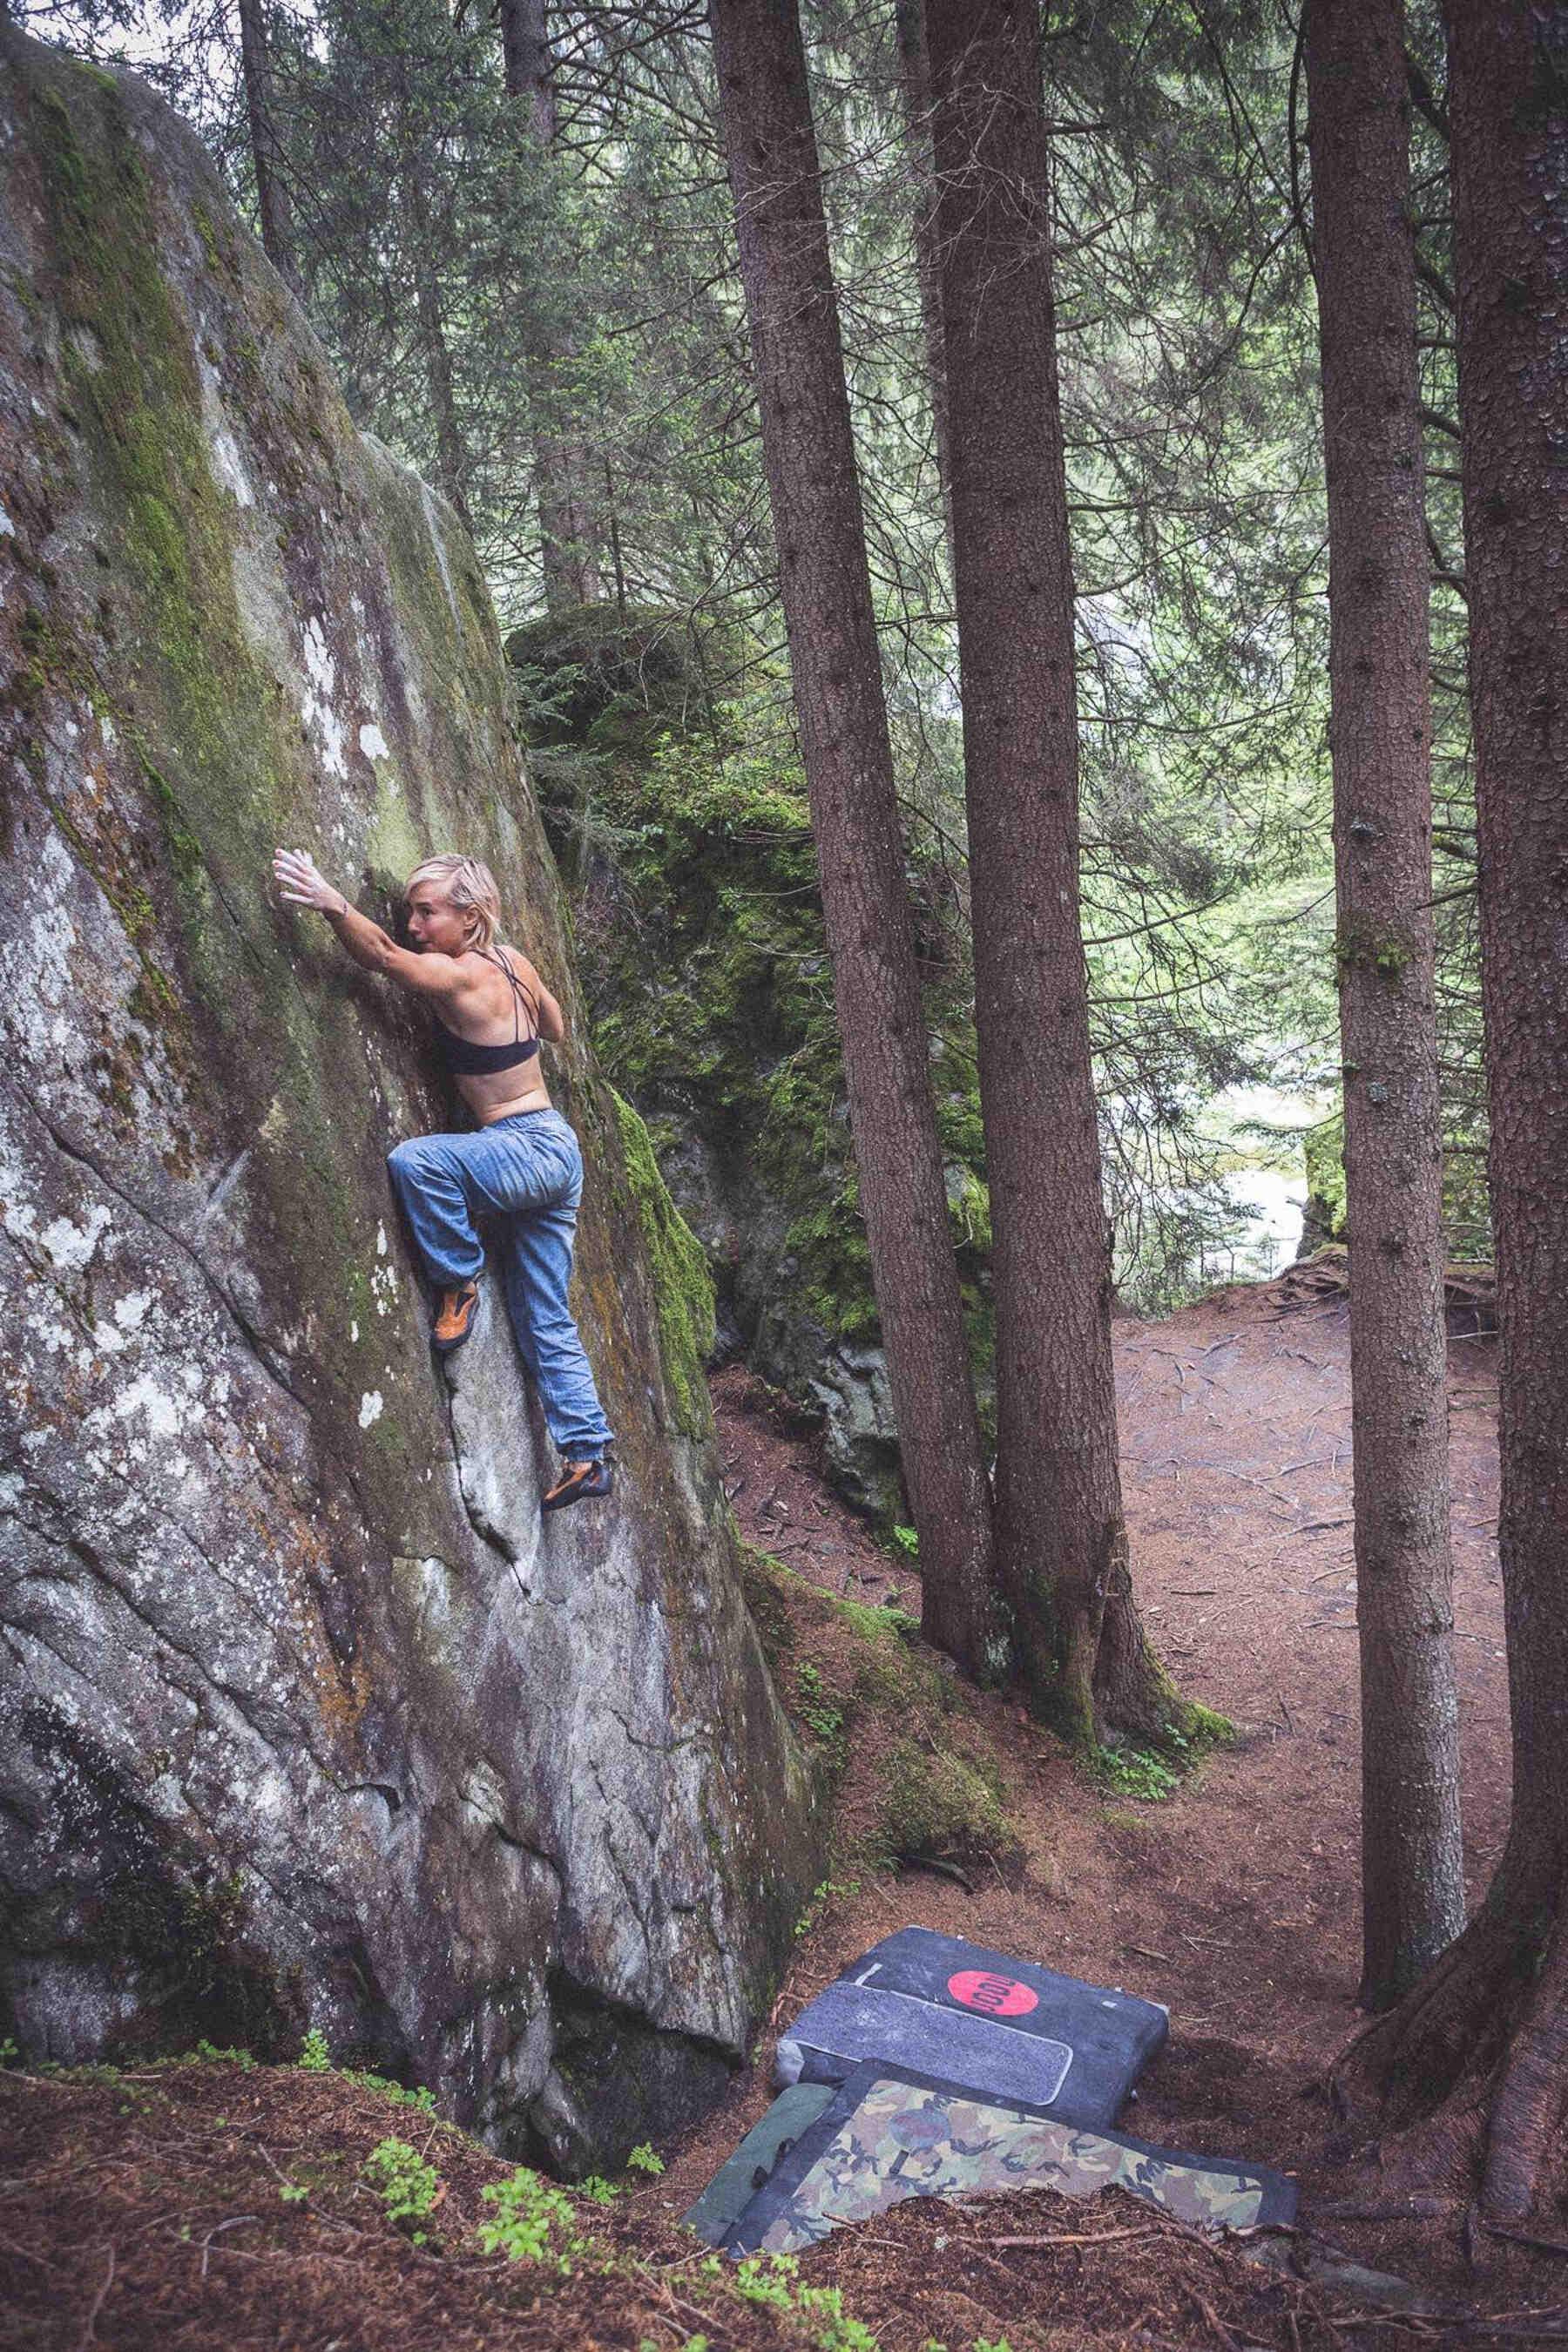 Zofia Reych, FrictionLabs rock climbing chalk pro athlete, Magic Wood, Chur, Switzerland